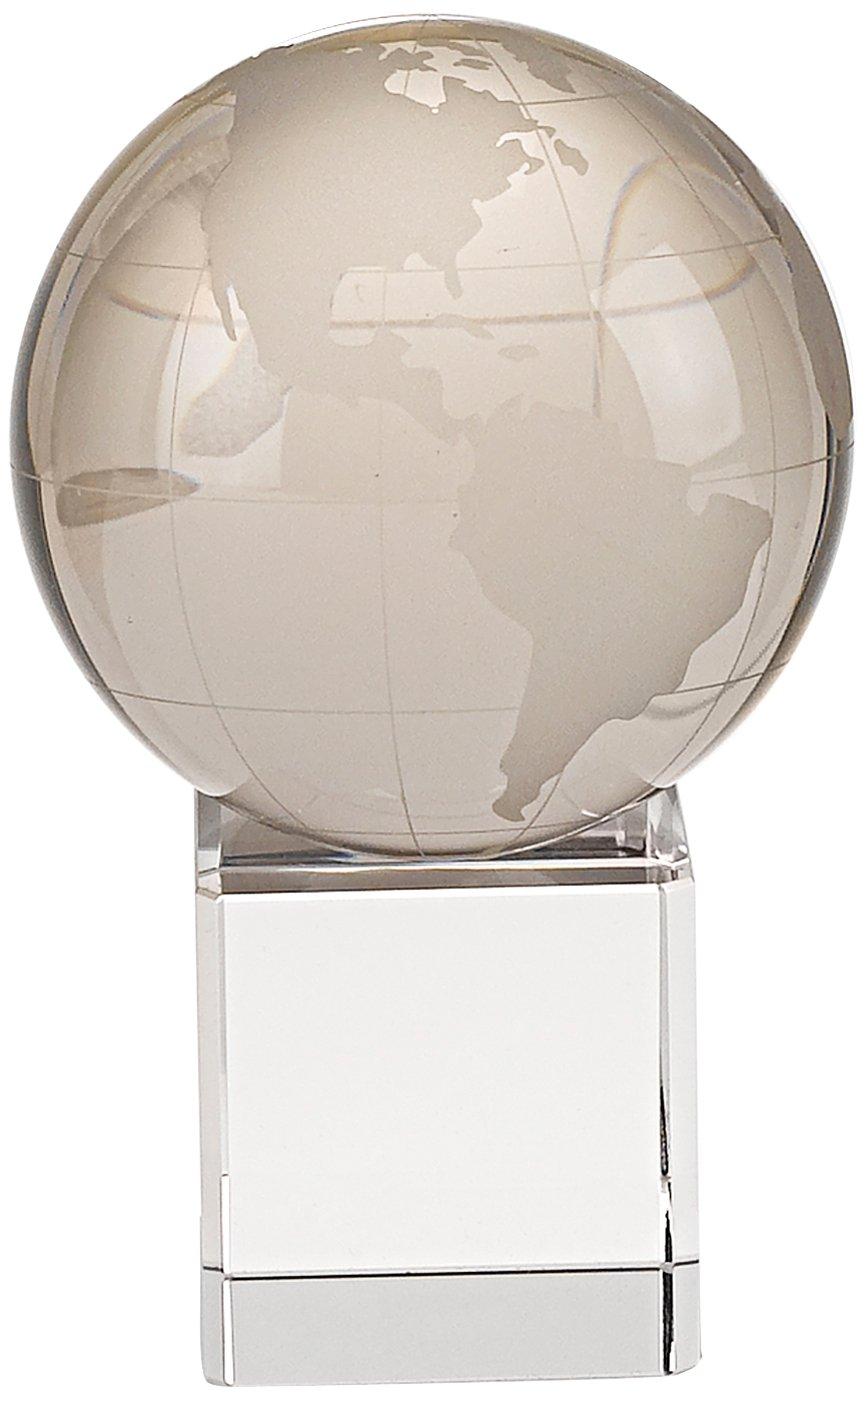 Badash Crystal Globe on Crystal Base 4.5 inches tall